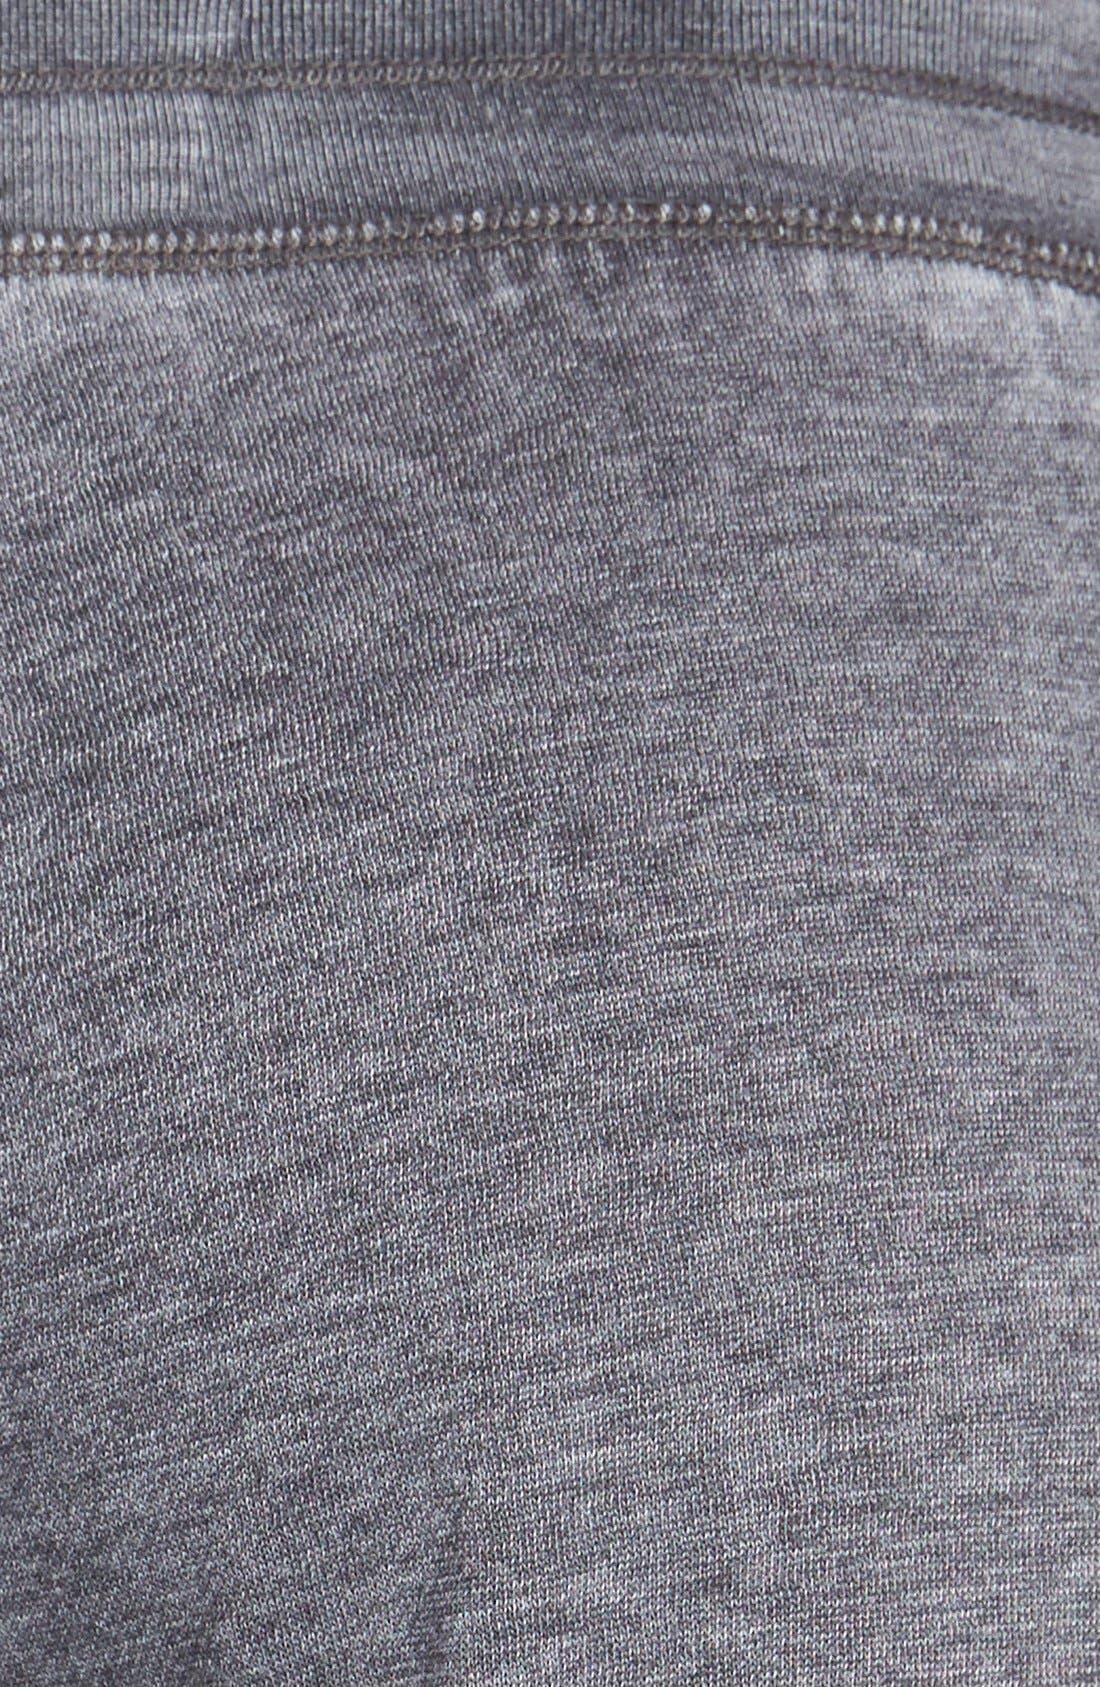 Alternate Image 3  - Marc New York by Andrew Marc Distressed Fleece Sweatpants